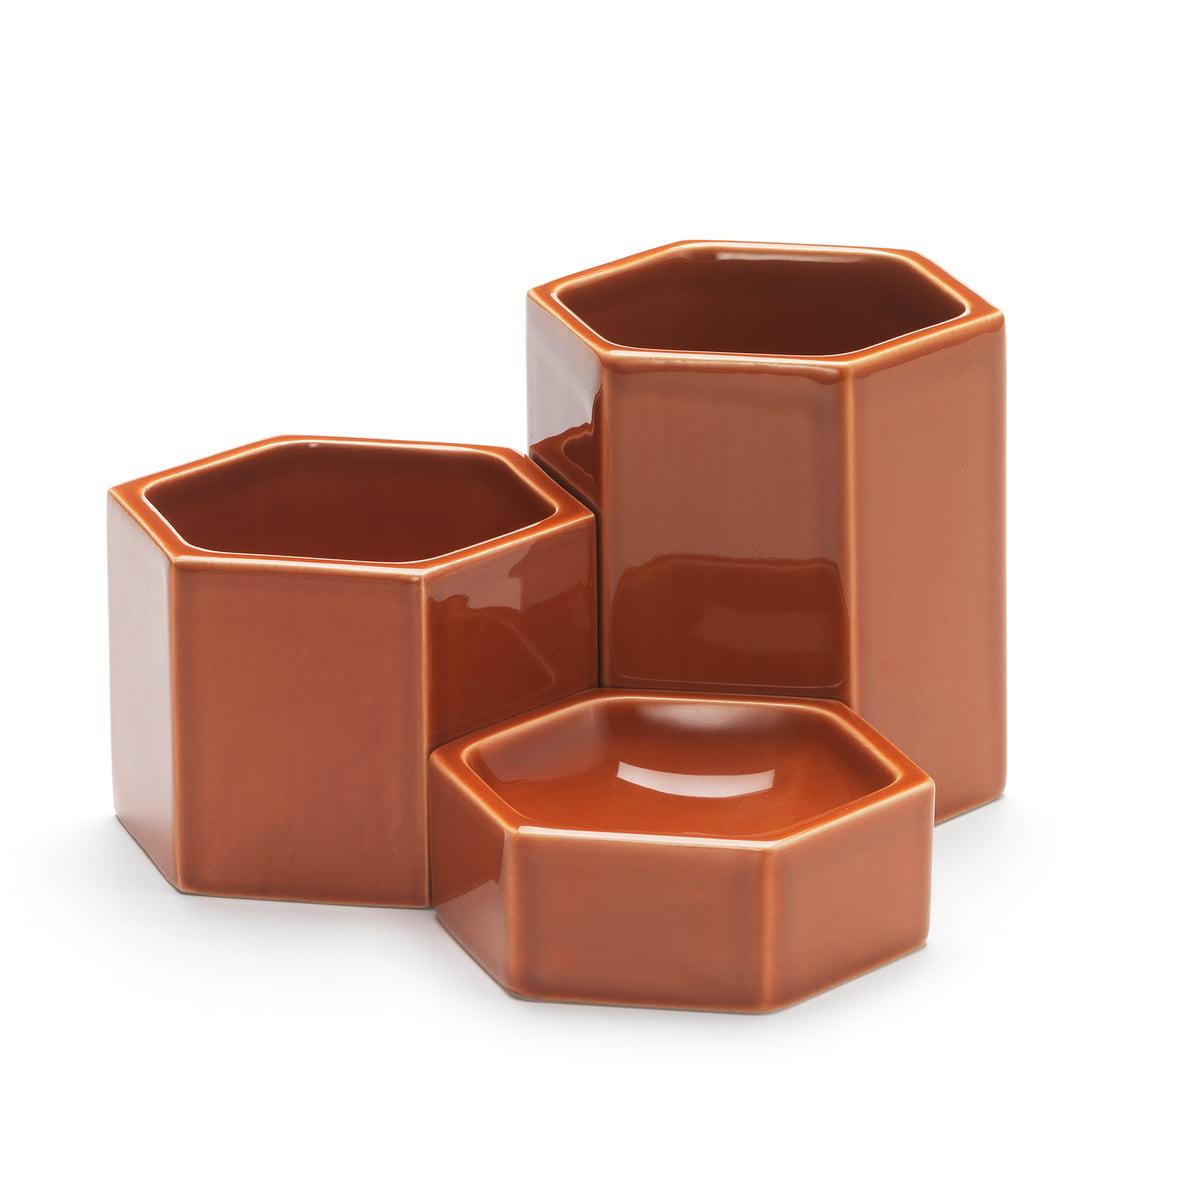 Vitra - Hexagonal Containers, rostorange (3er-Set)   Büro > Büroschränke > Container   Rostbraun   Keramik   Vitra